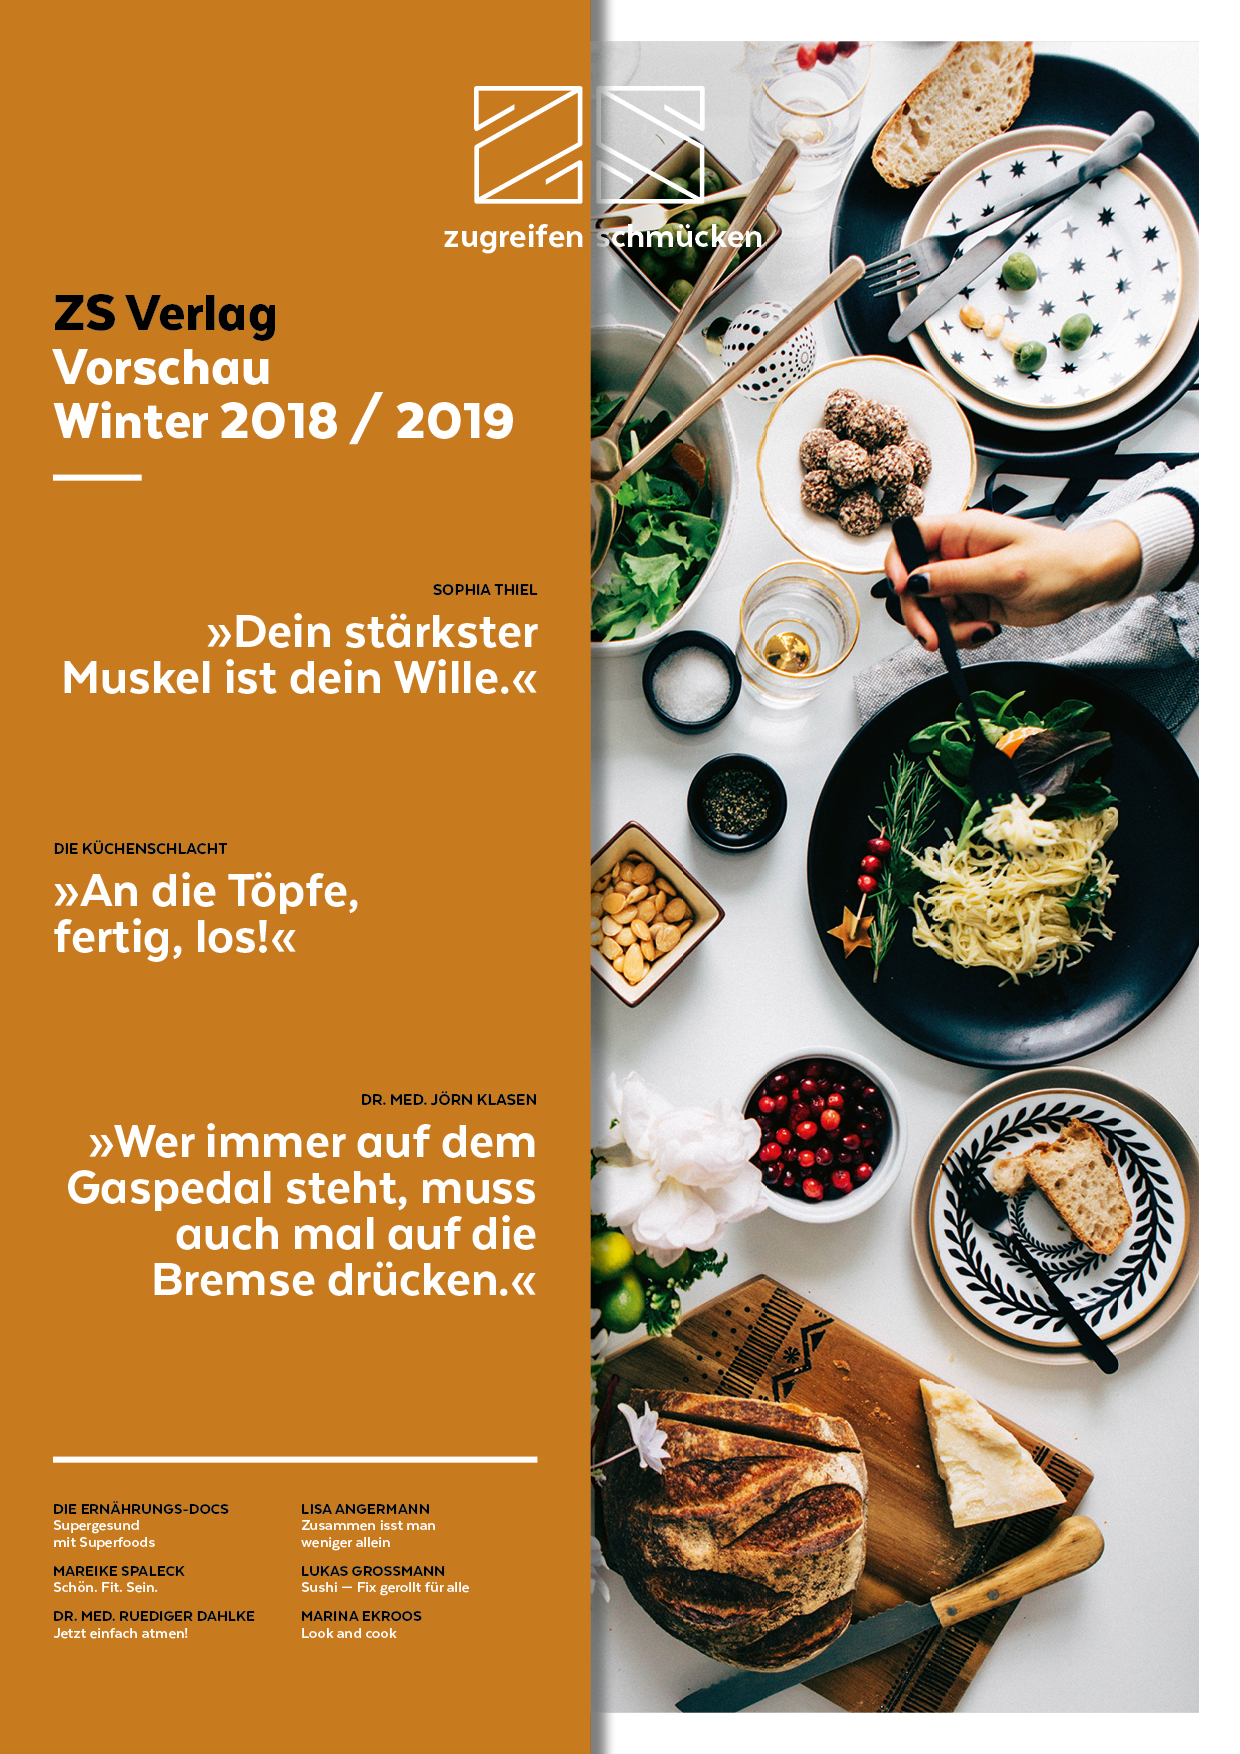 ZS Verlag Winter 2018/2019